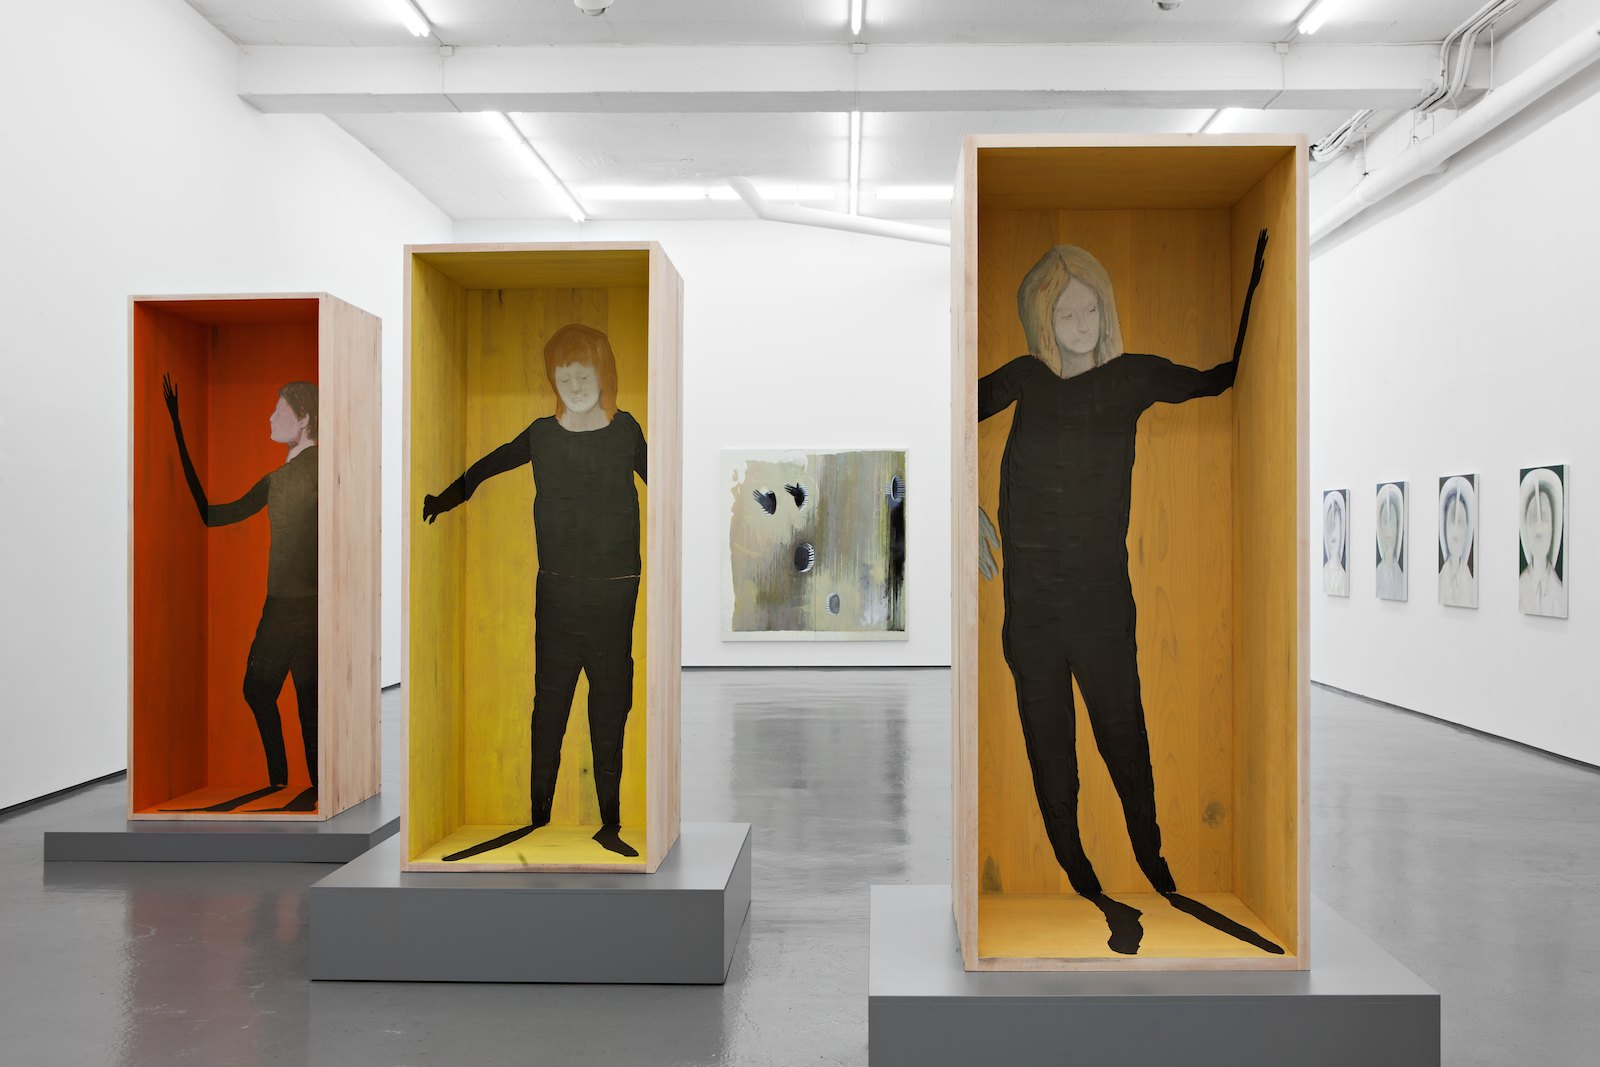 Installation view, Håvard Homstvedt, Truth Pops a Reflex, Galleri Riis, Oslo, 2012